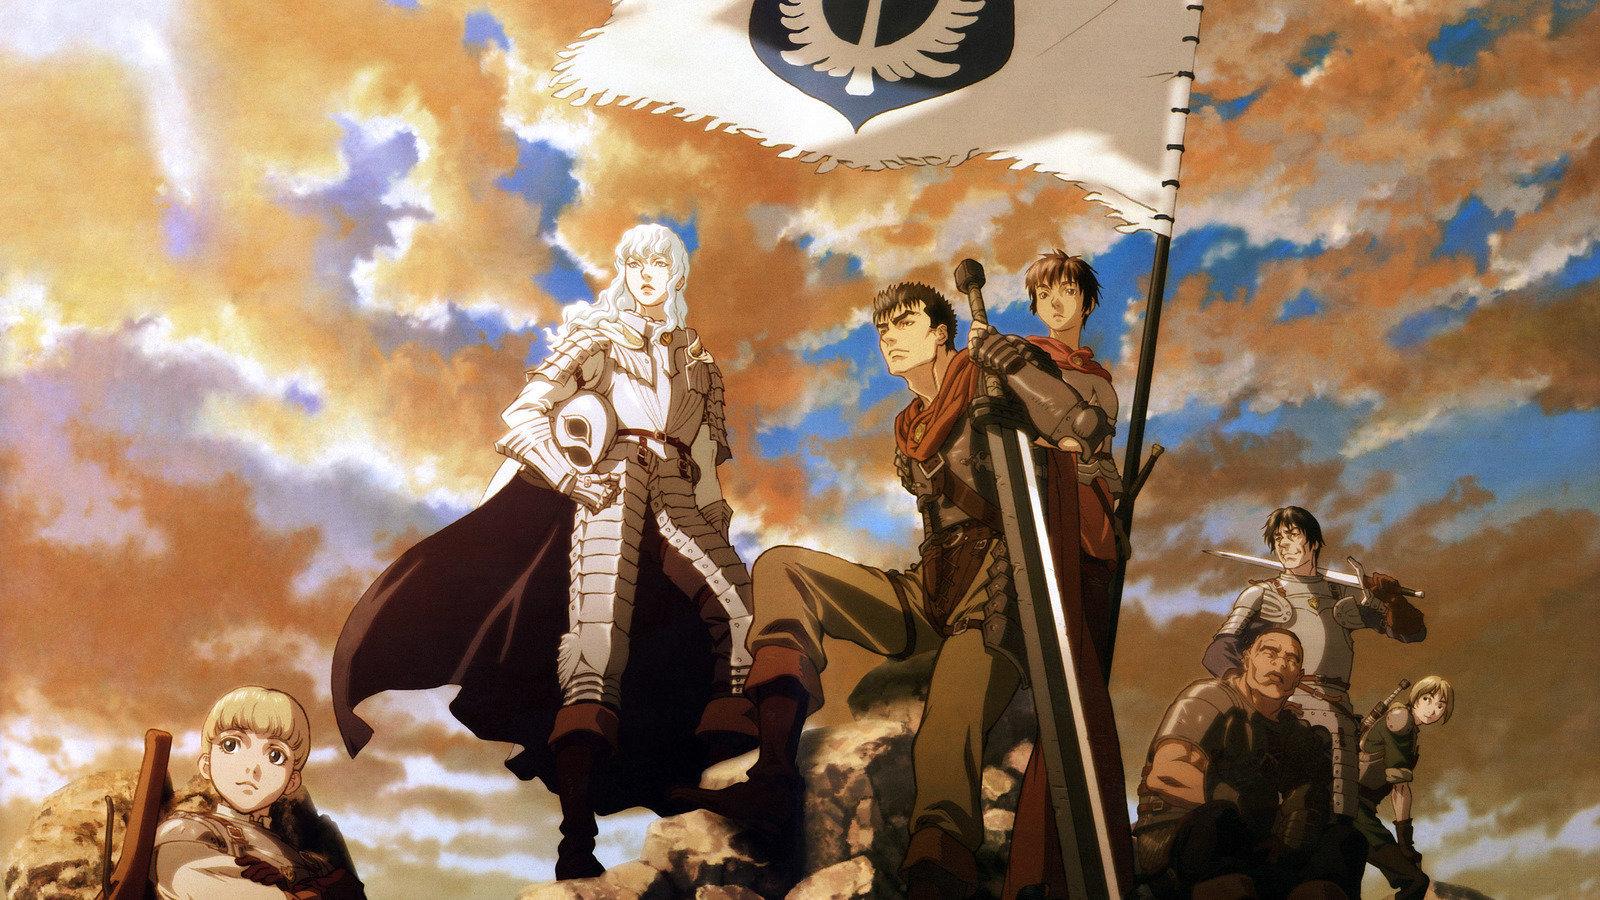 Petition Kentaro Miura Berserk 2d An Accurate Representation